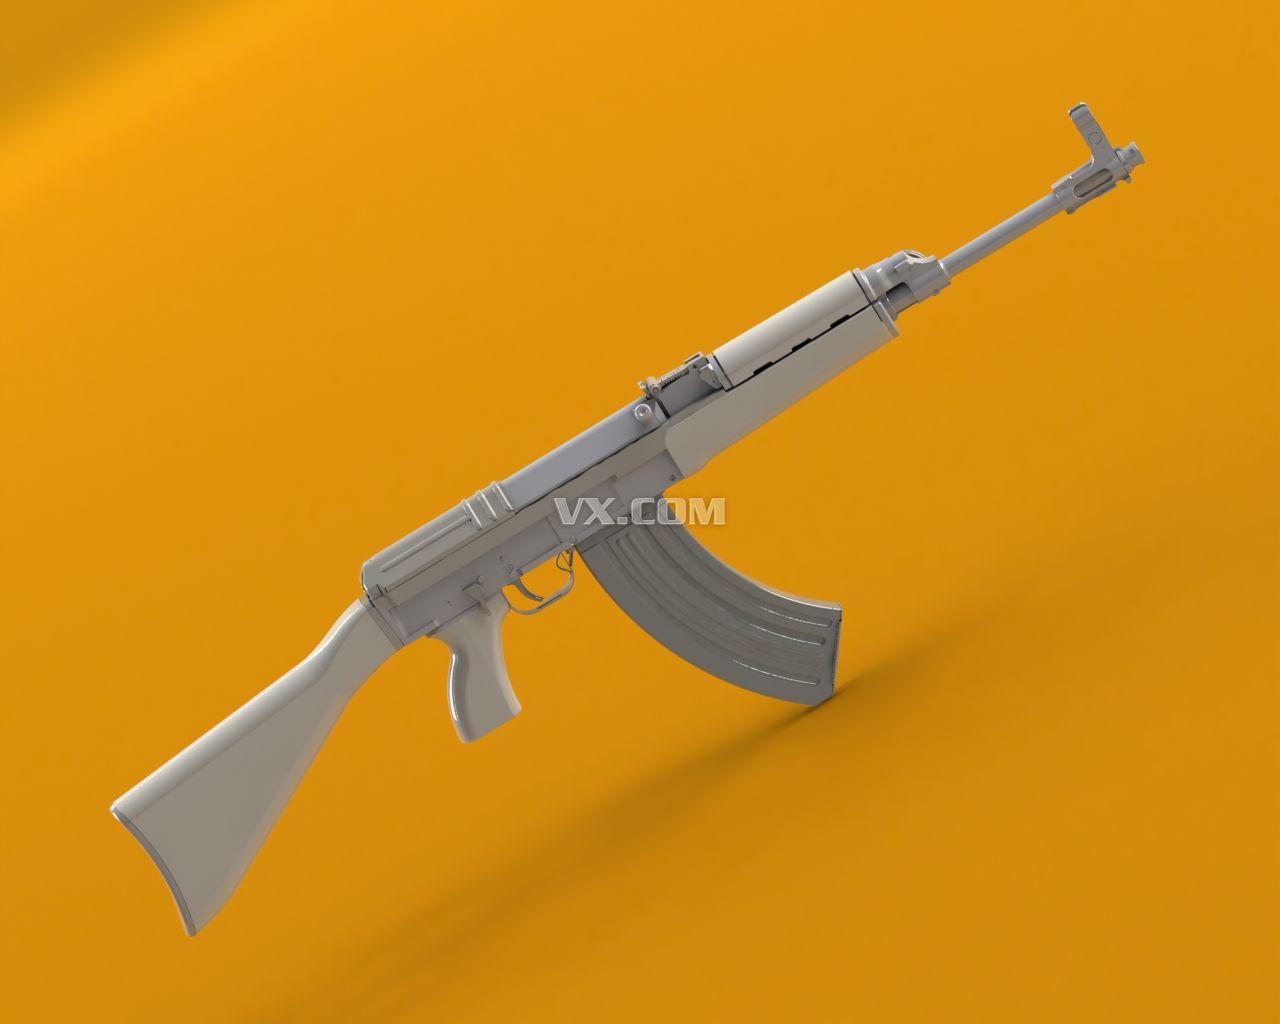 Solidworks Ak47突击步枪简笔画内容图片展示 Ak47突击步枪简笔画图片下载